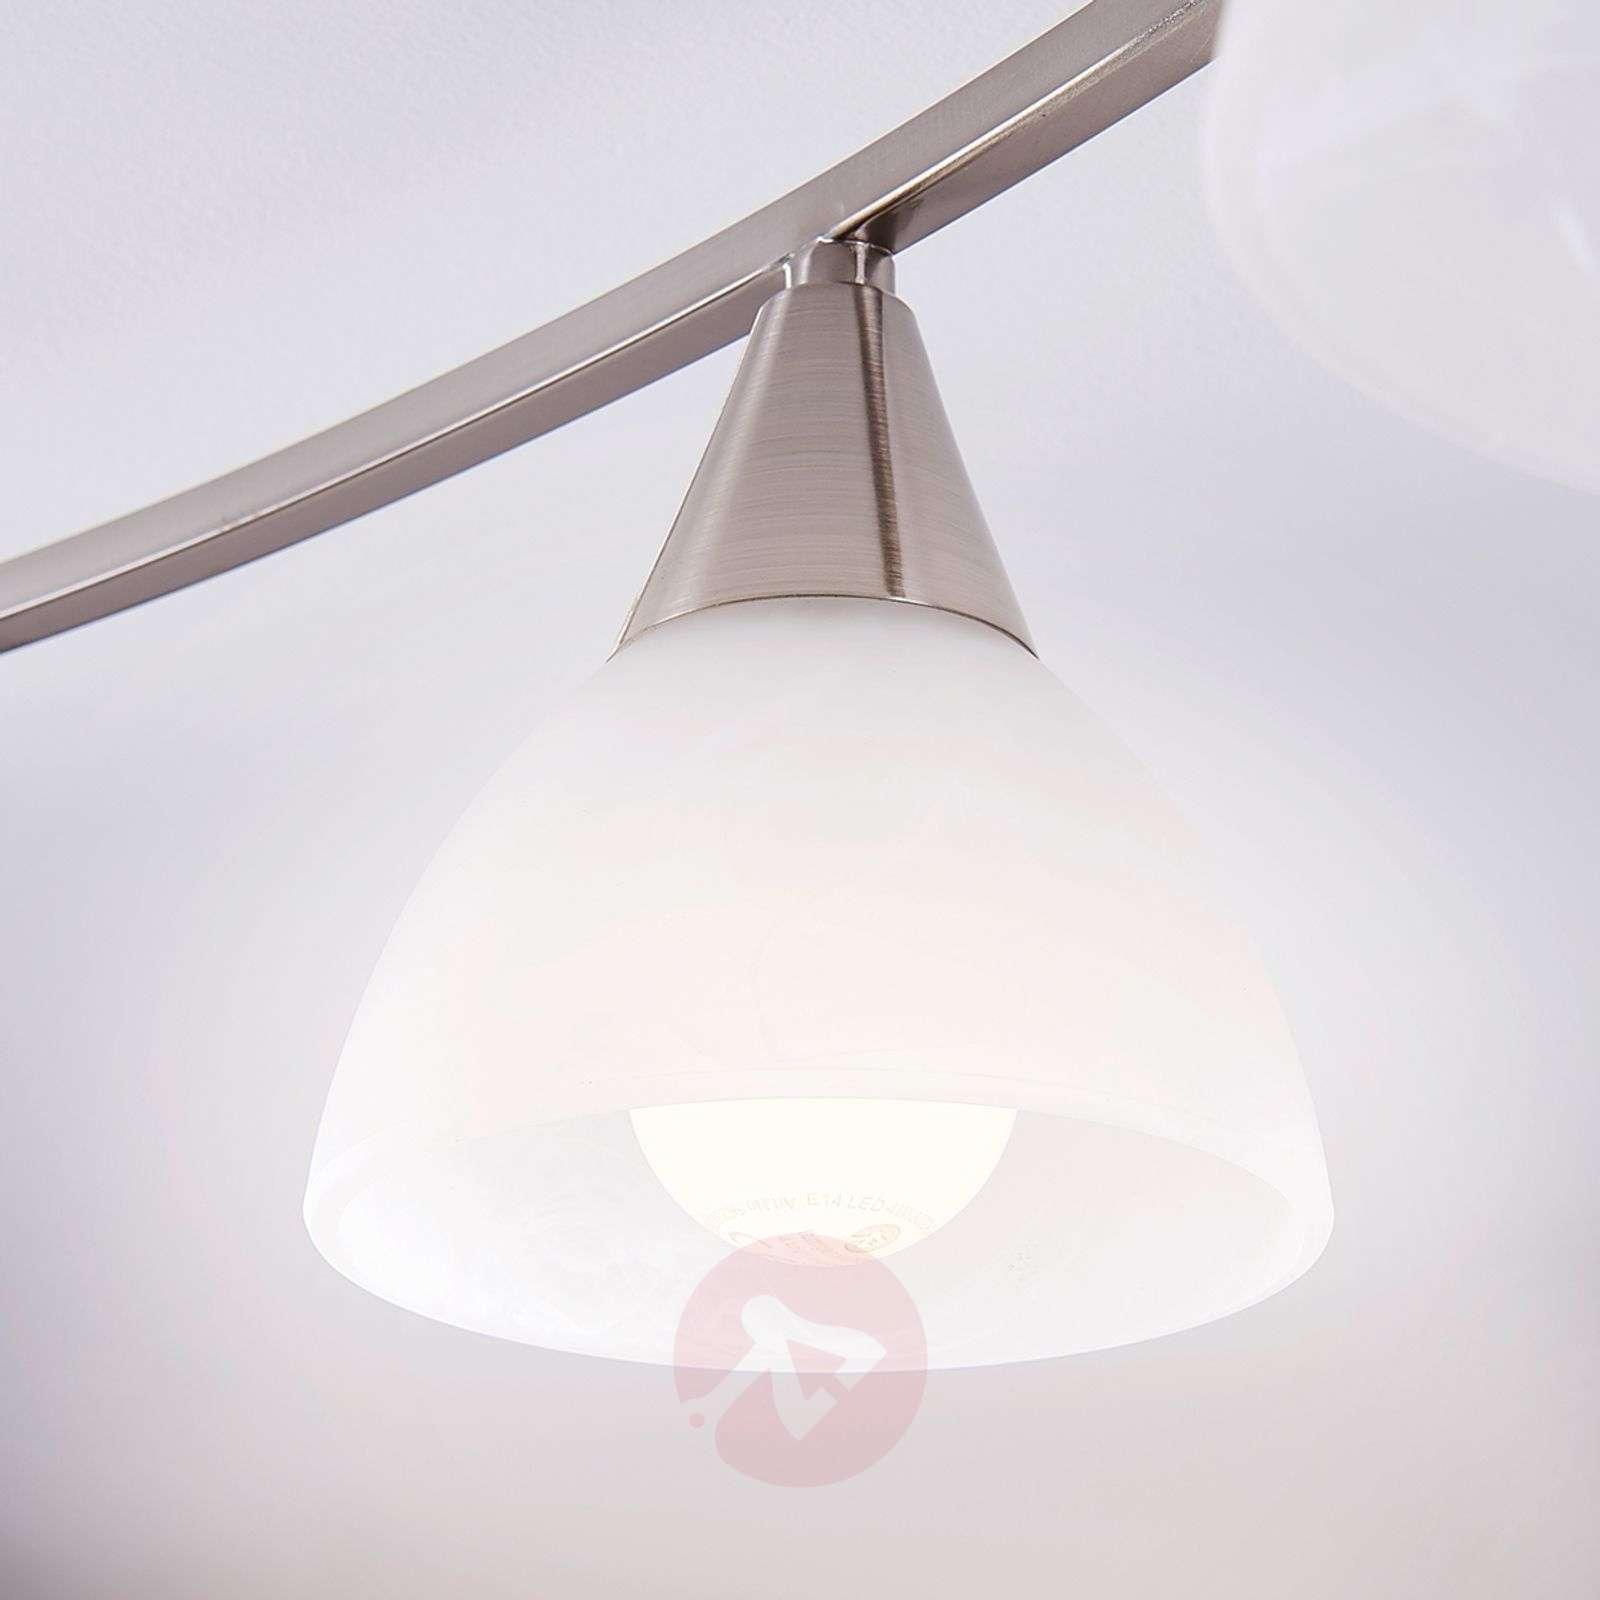 5-lampp. Della LED-kattovalaisin, matta nikkeli-9620973-03